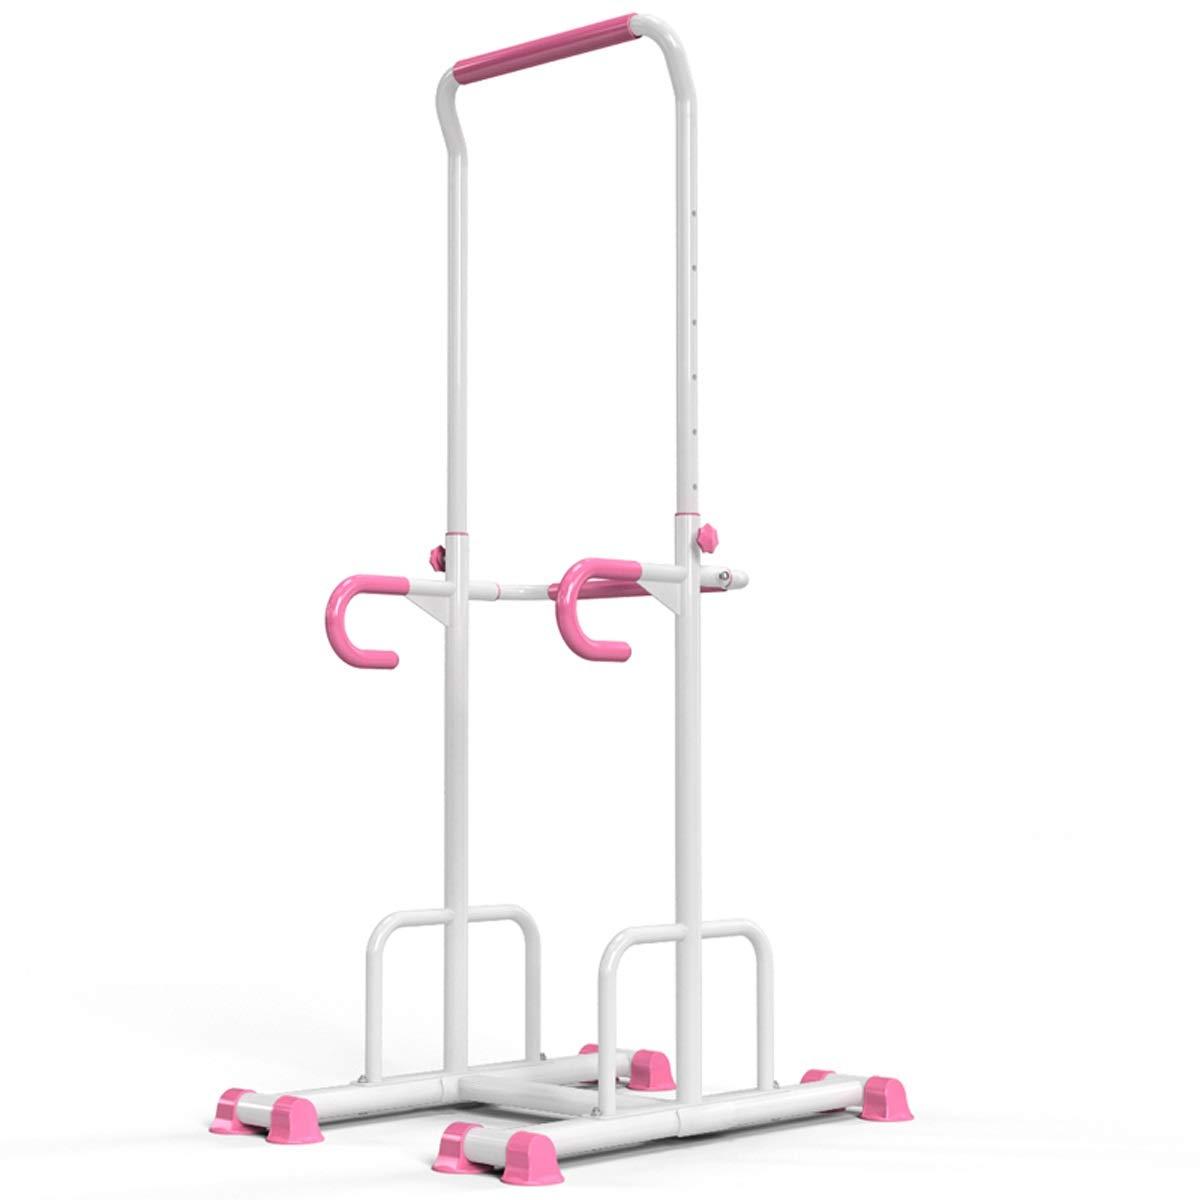 Baianju Home Indoor Pull-ups Horizontal Bar Double-bar Multi-Functional Fitness Equipment Increased Family Sporting Goods